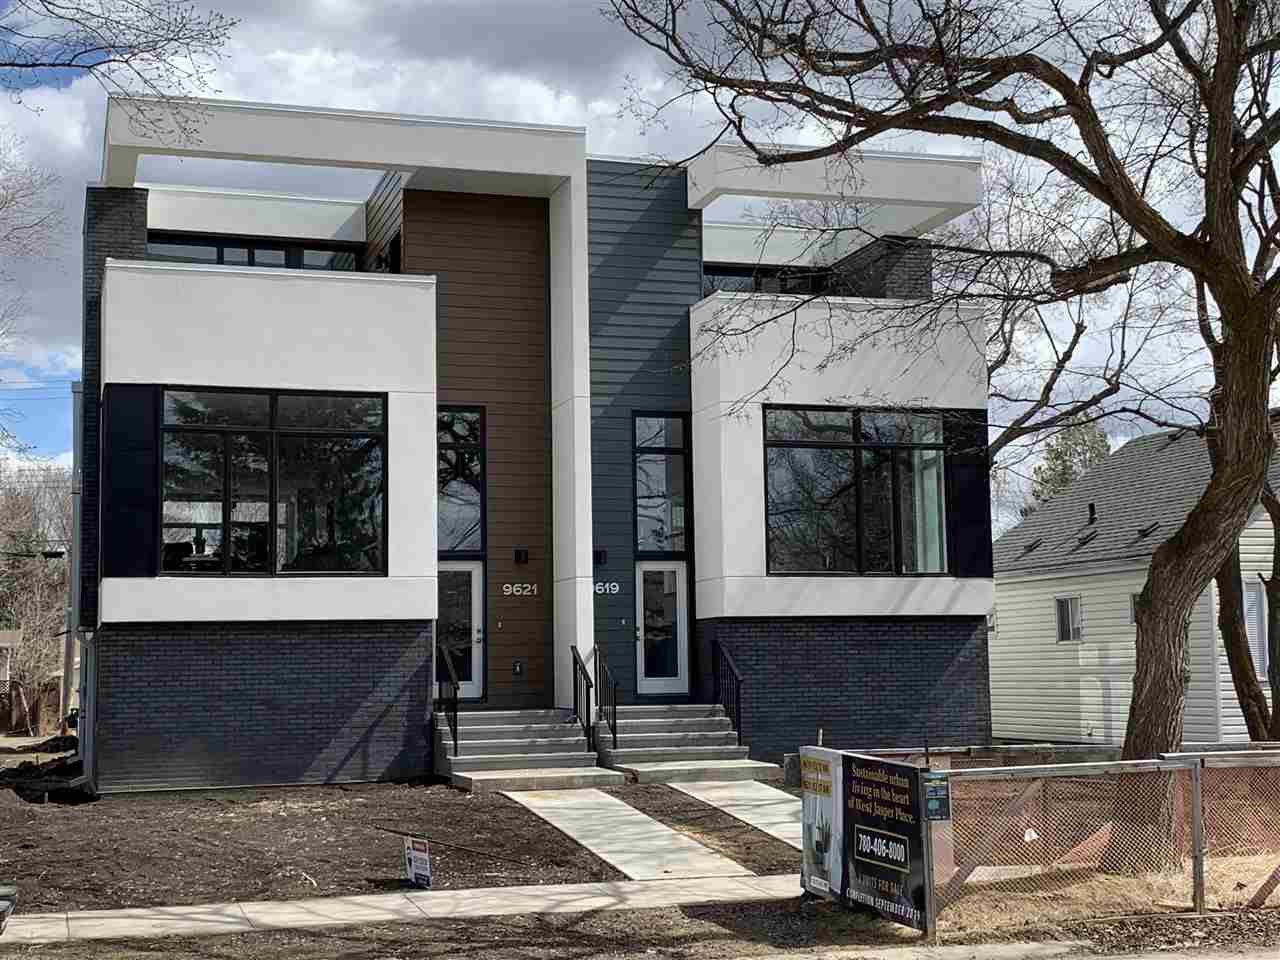 Main Photo: 9621 152 Street in Edmonton: Zone 22 House Half Duplex for sale : MLS®# E4194019